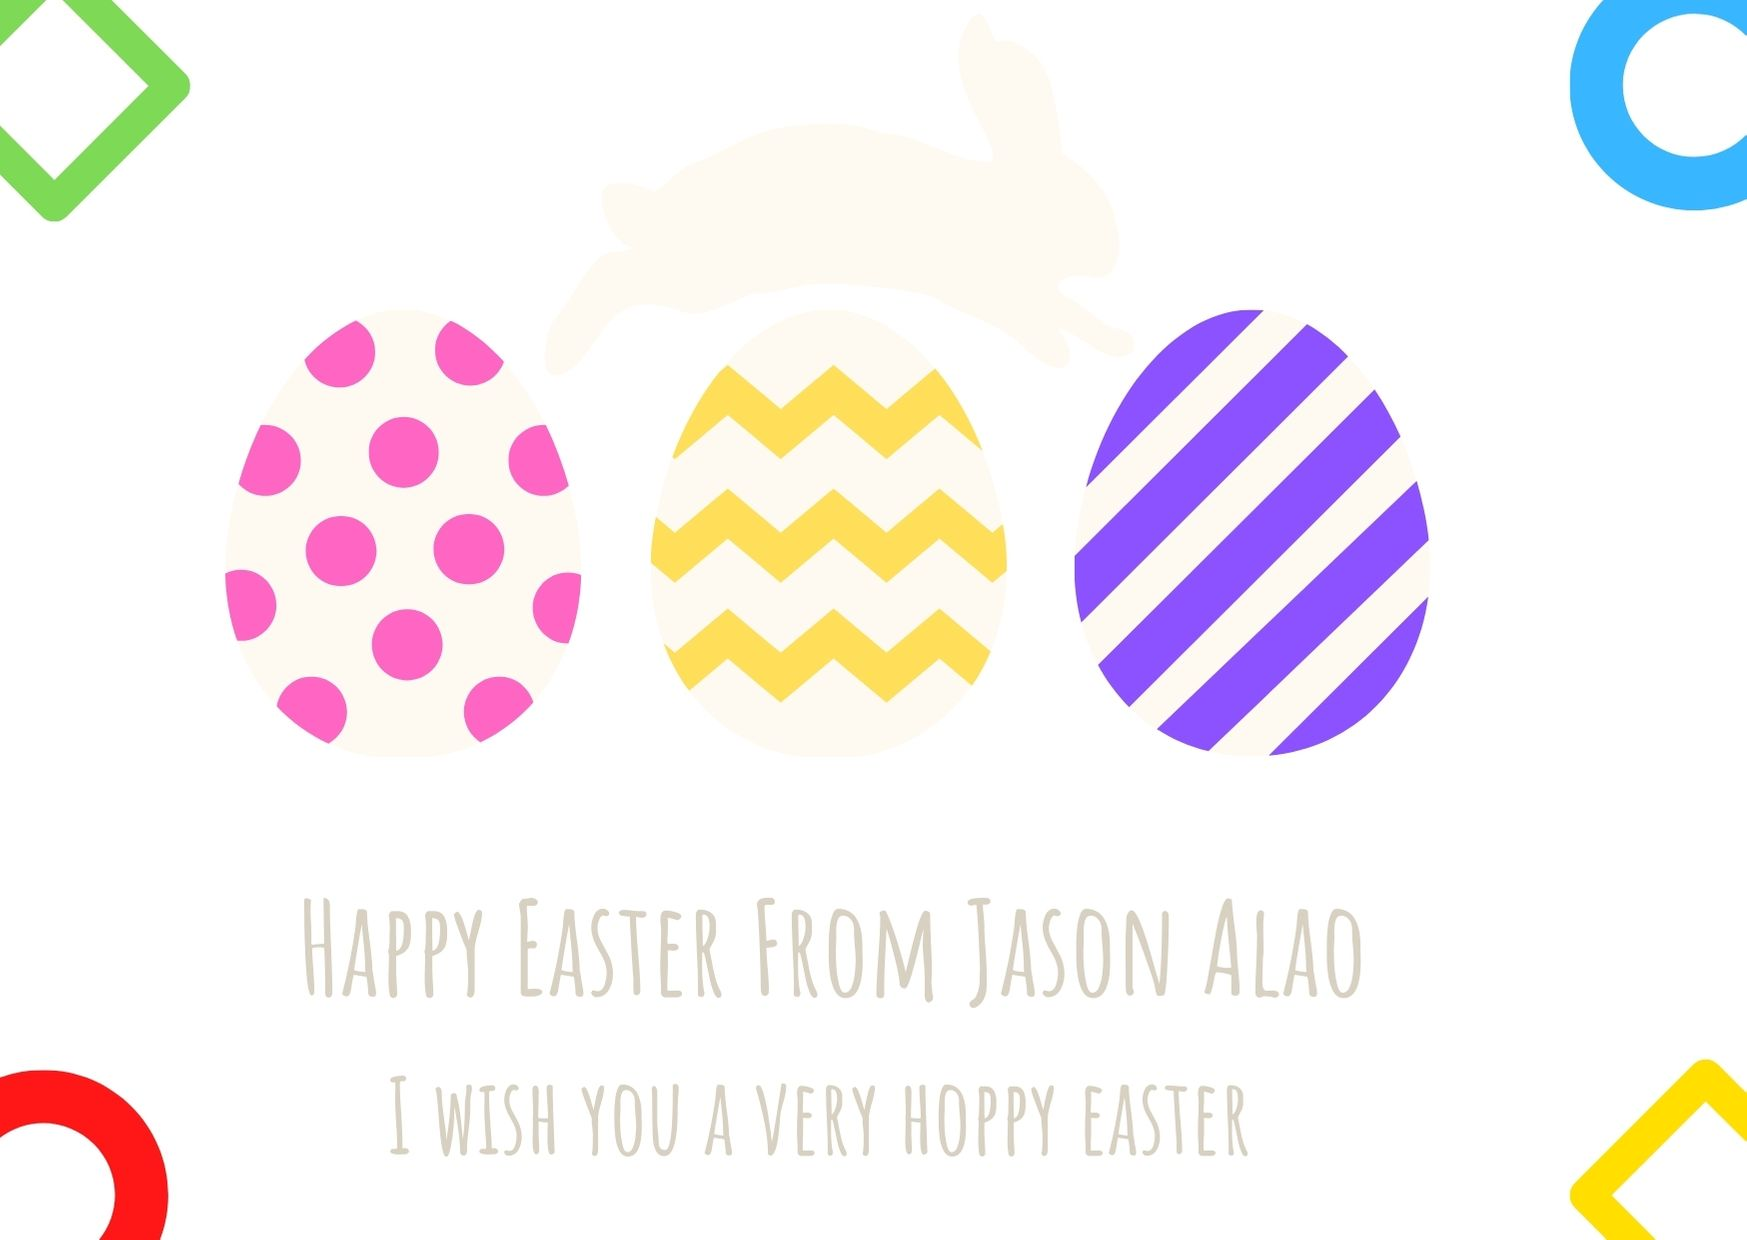 https://edustemlab.com/wp-content/uploads/2021/04/Happy-Easter-From-jason-Alao.jpg